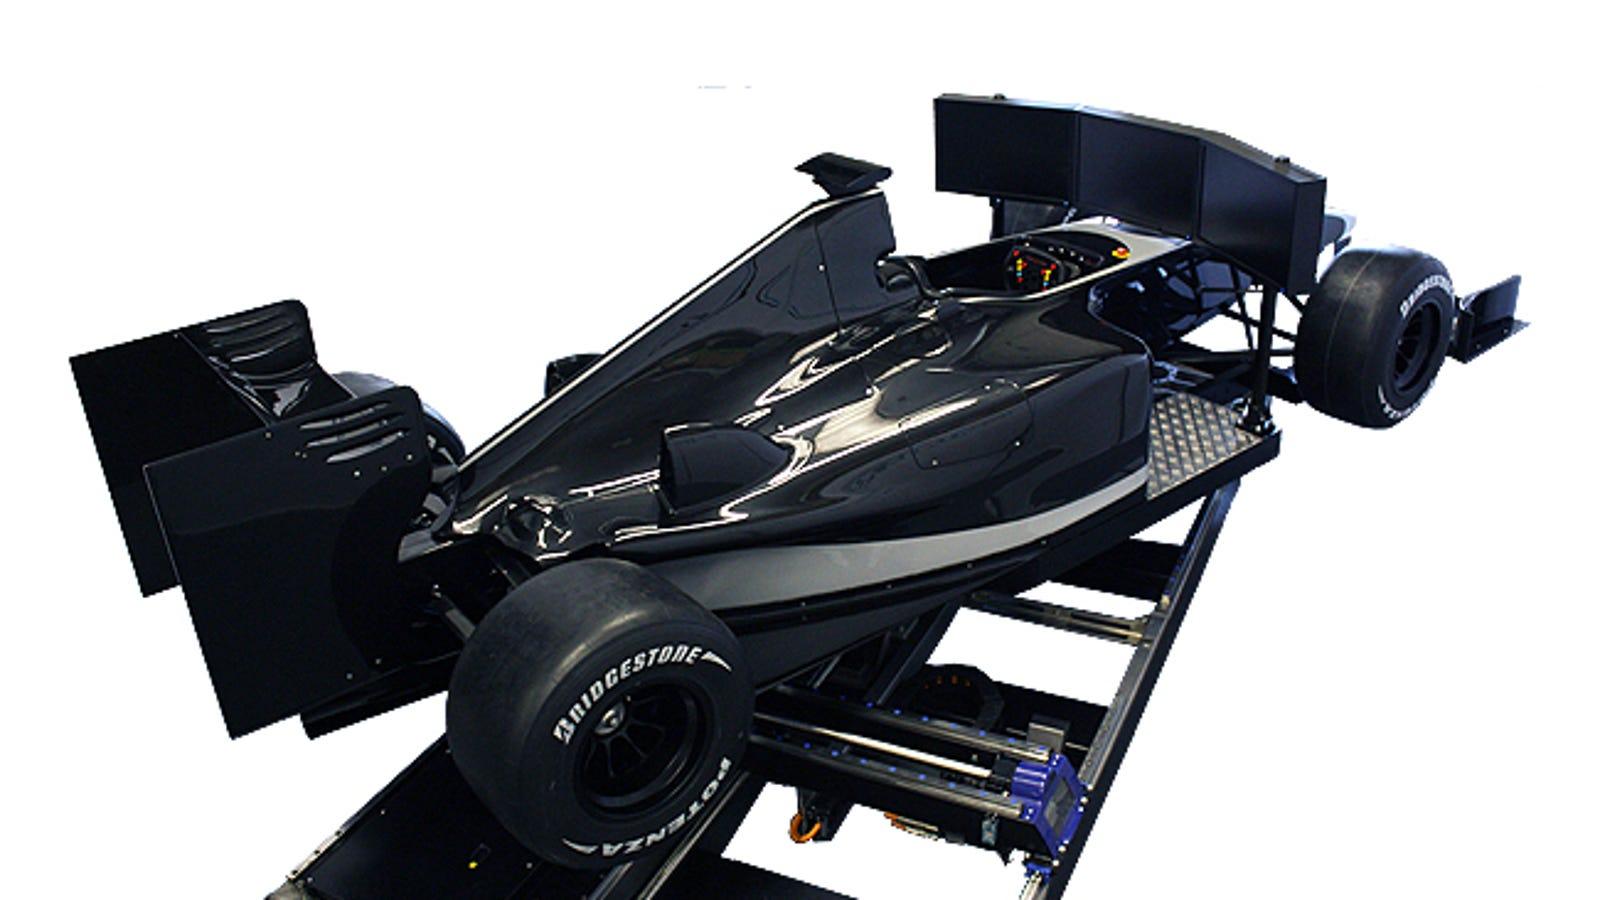 This Full Scale F1 Simulator Is Insane